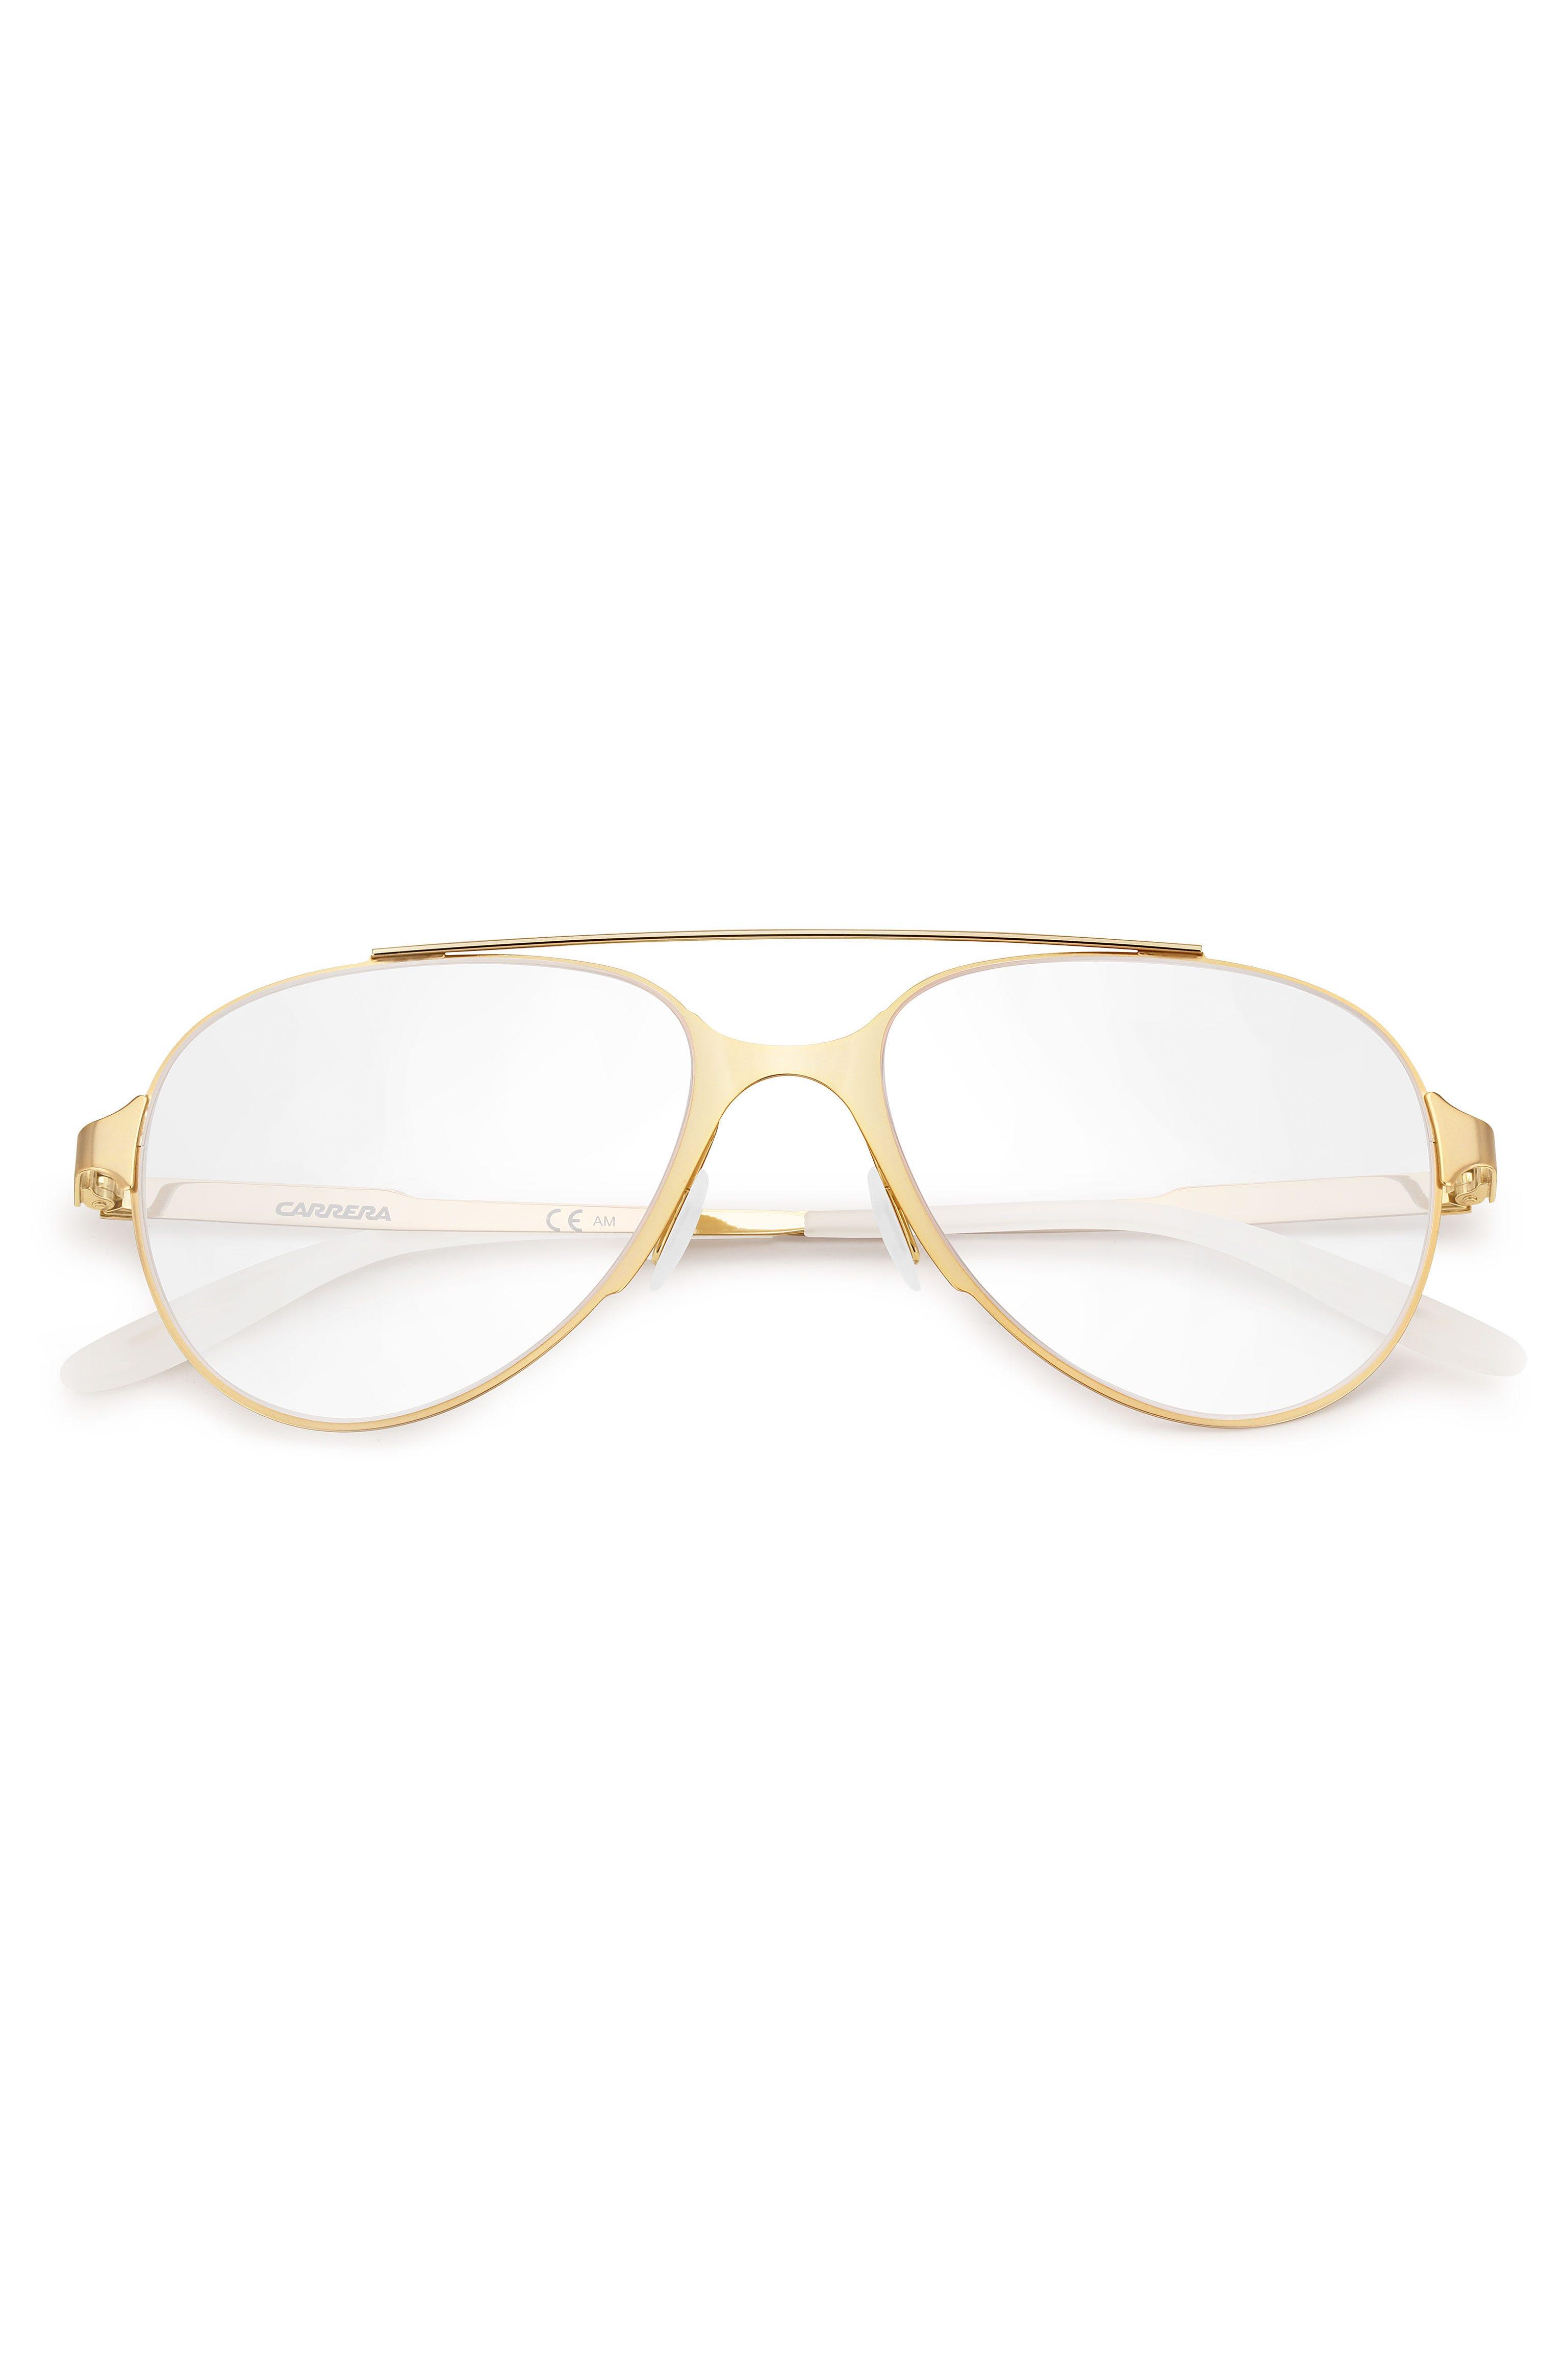 Eyeglass Frames Non Prescription : Fake Glasses - How To Wear Non Prescription Frames